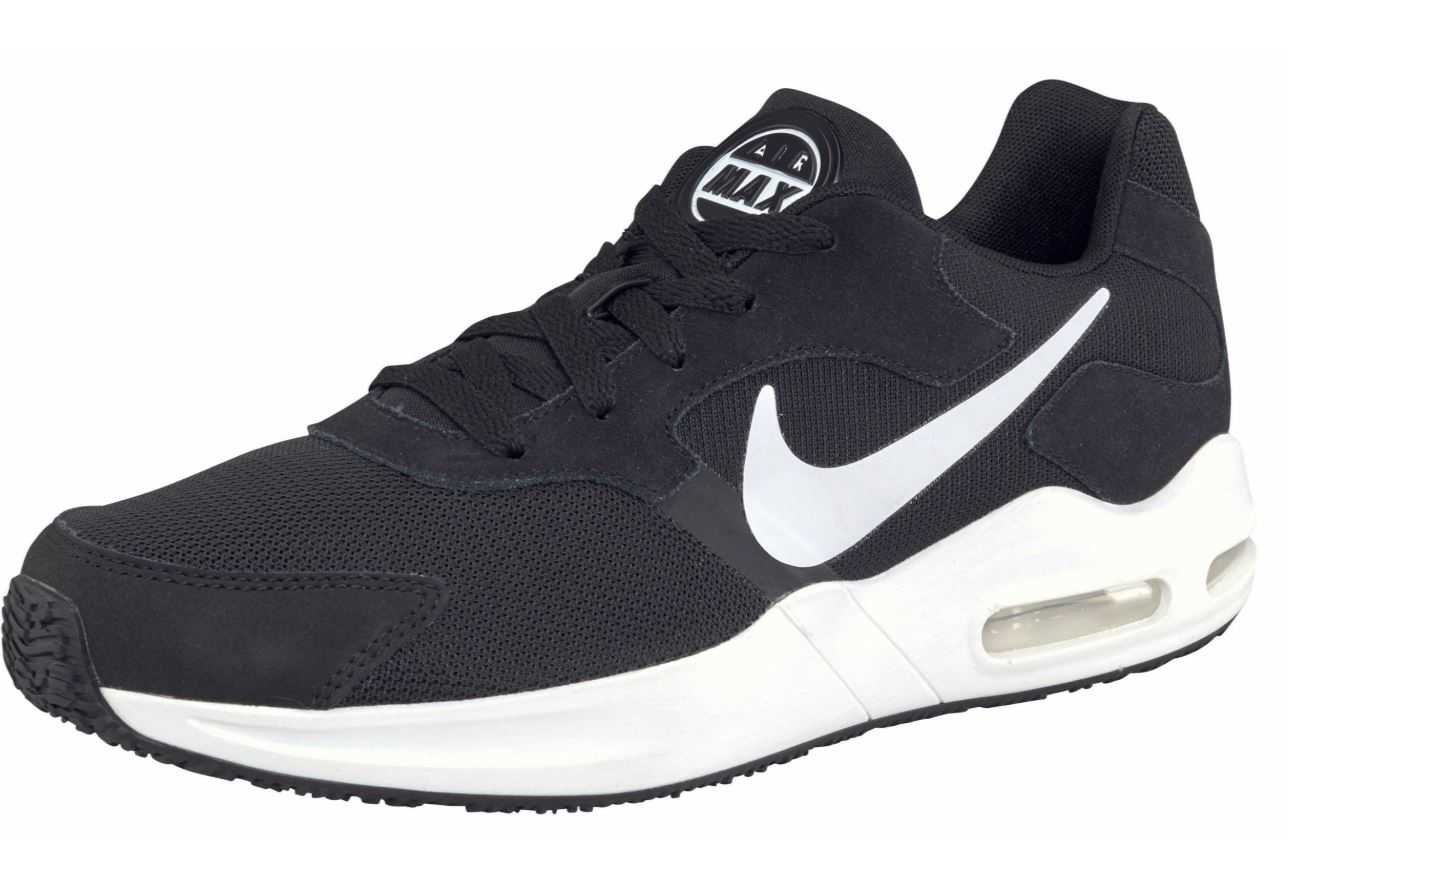 2018 09 18 14 11 38 Nike Sportswear Air Max Guile Sneaker kaufen OTTO